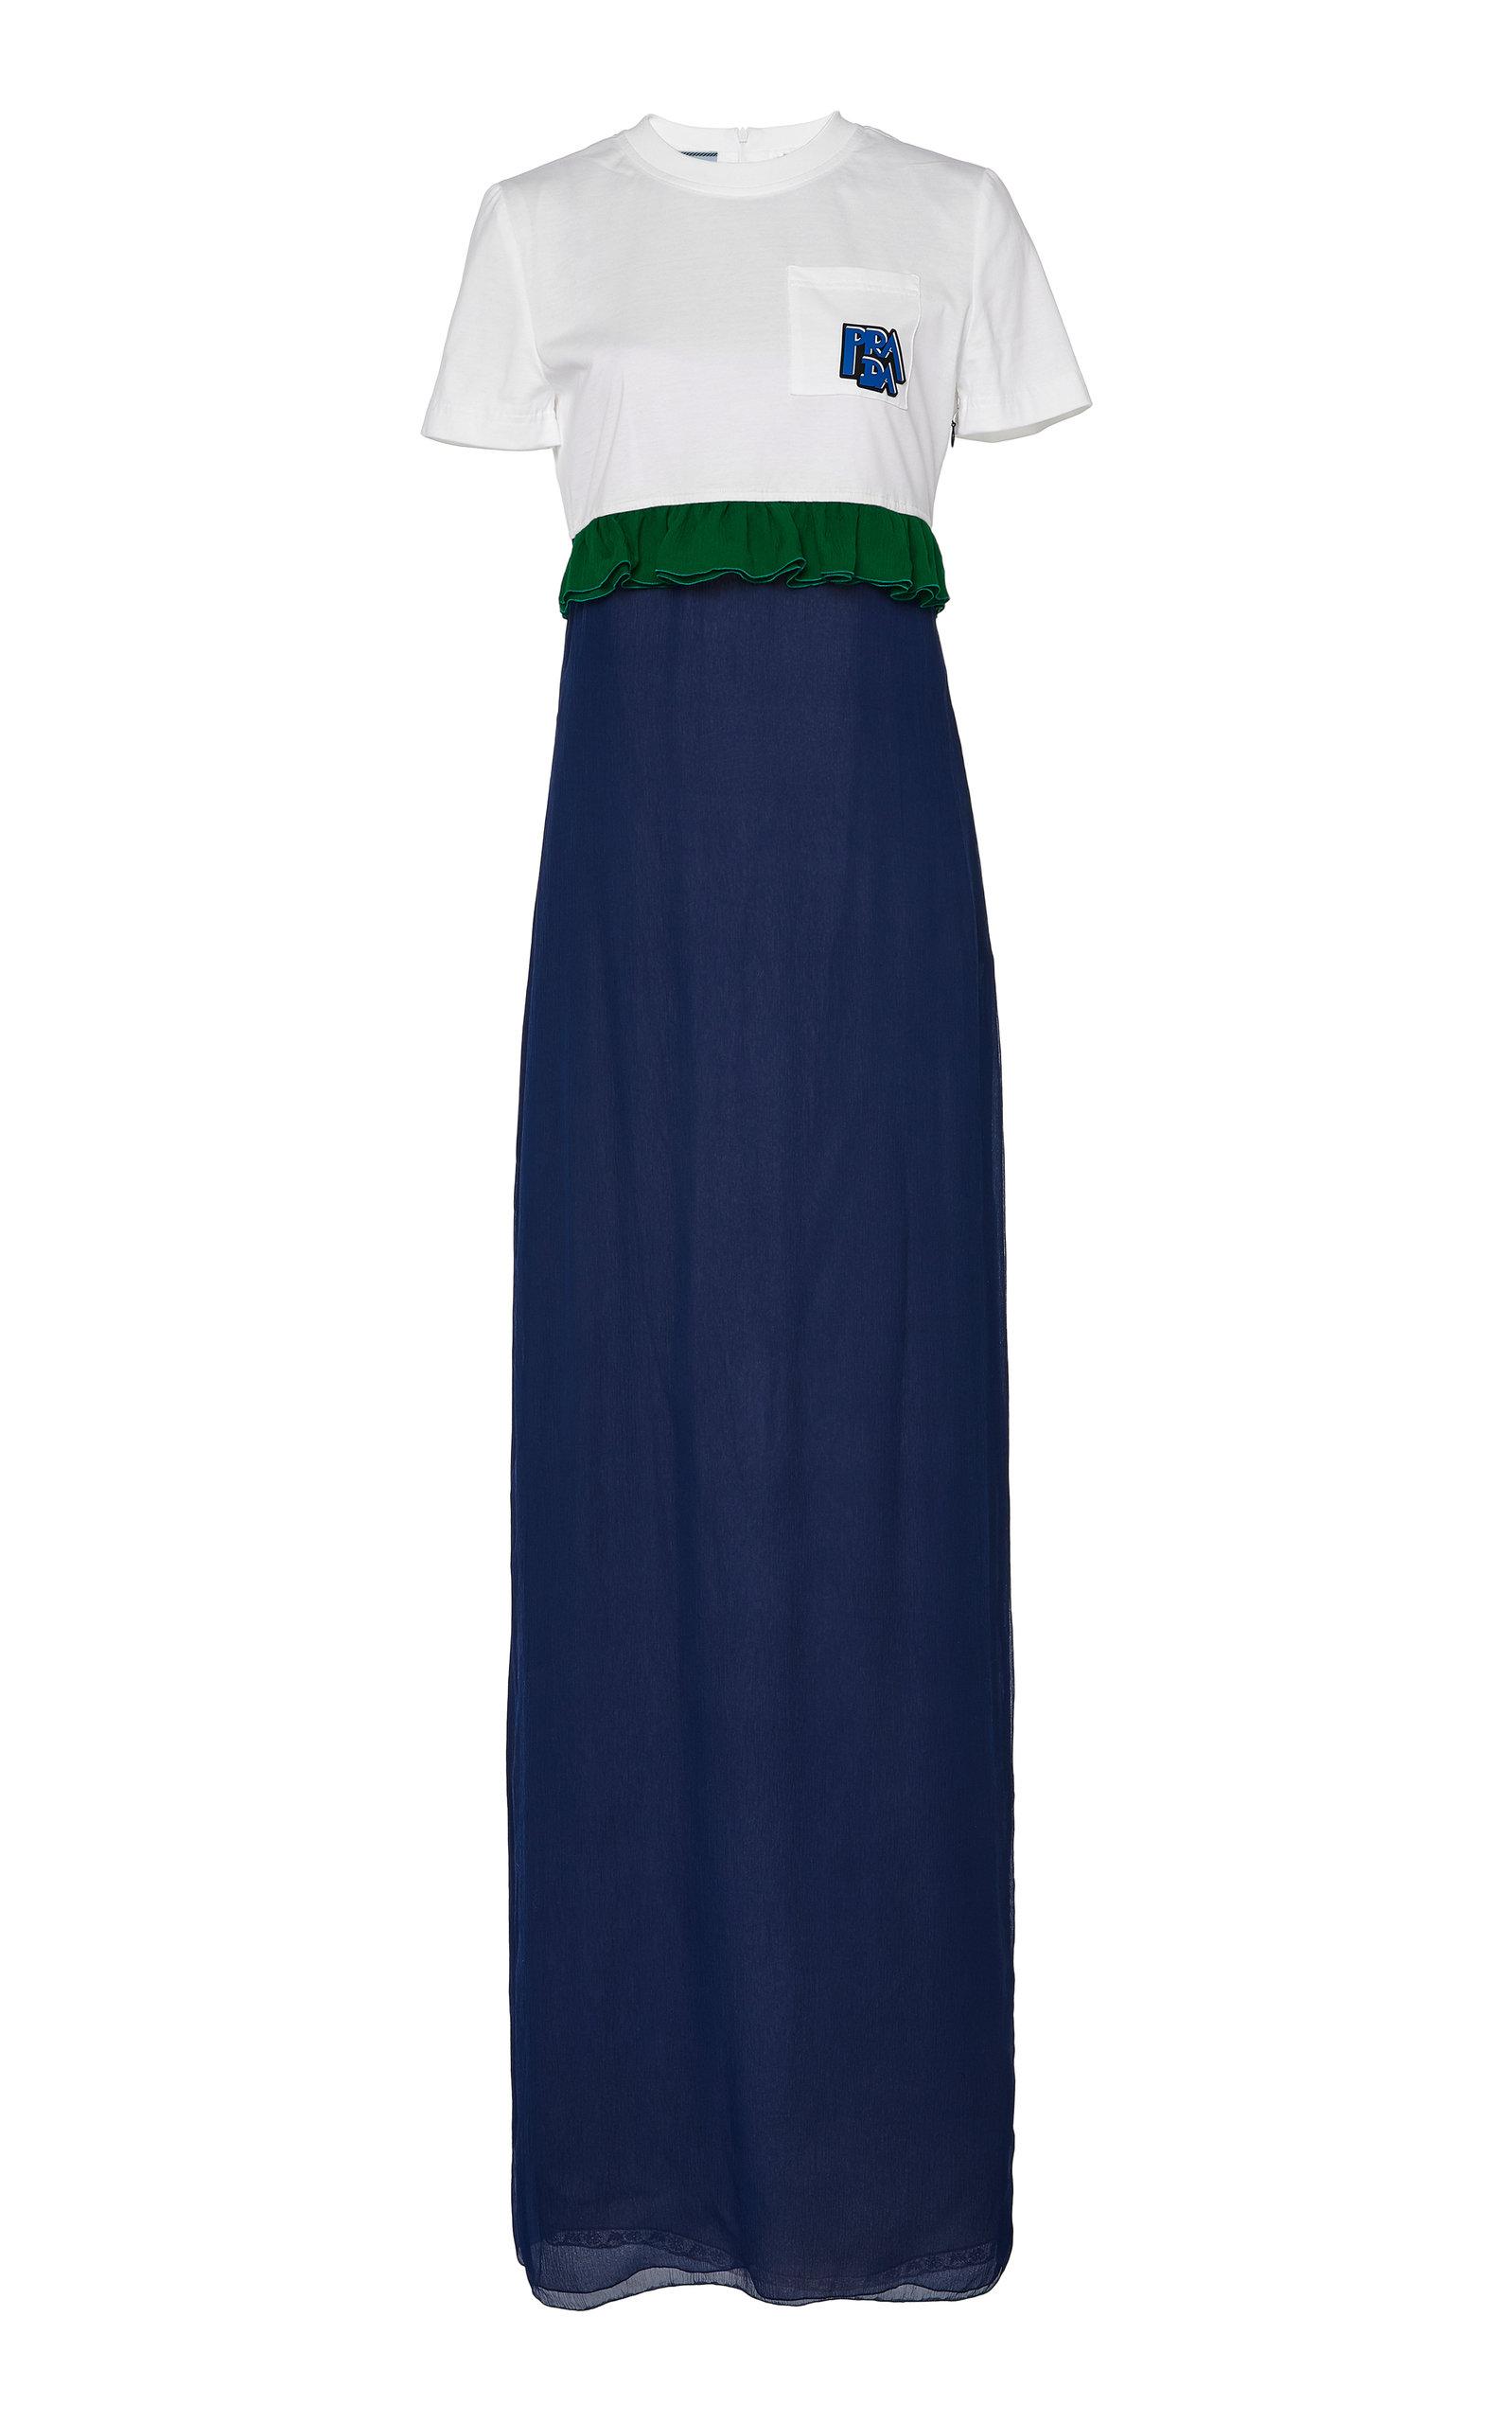 Buy Prada Silk-Chiffon Maxi T-Shirt Dress online, shop Prada at the best price